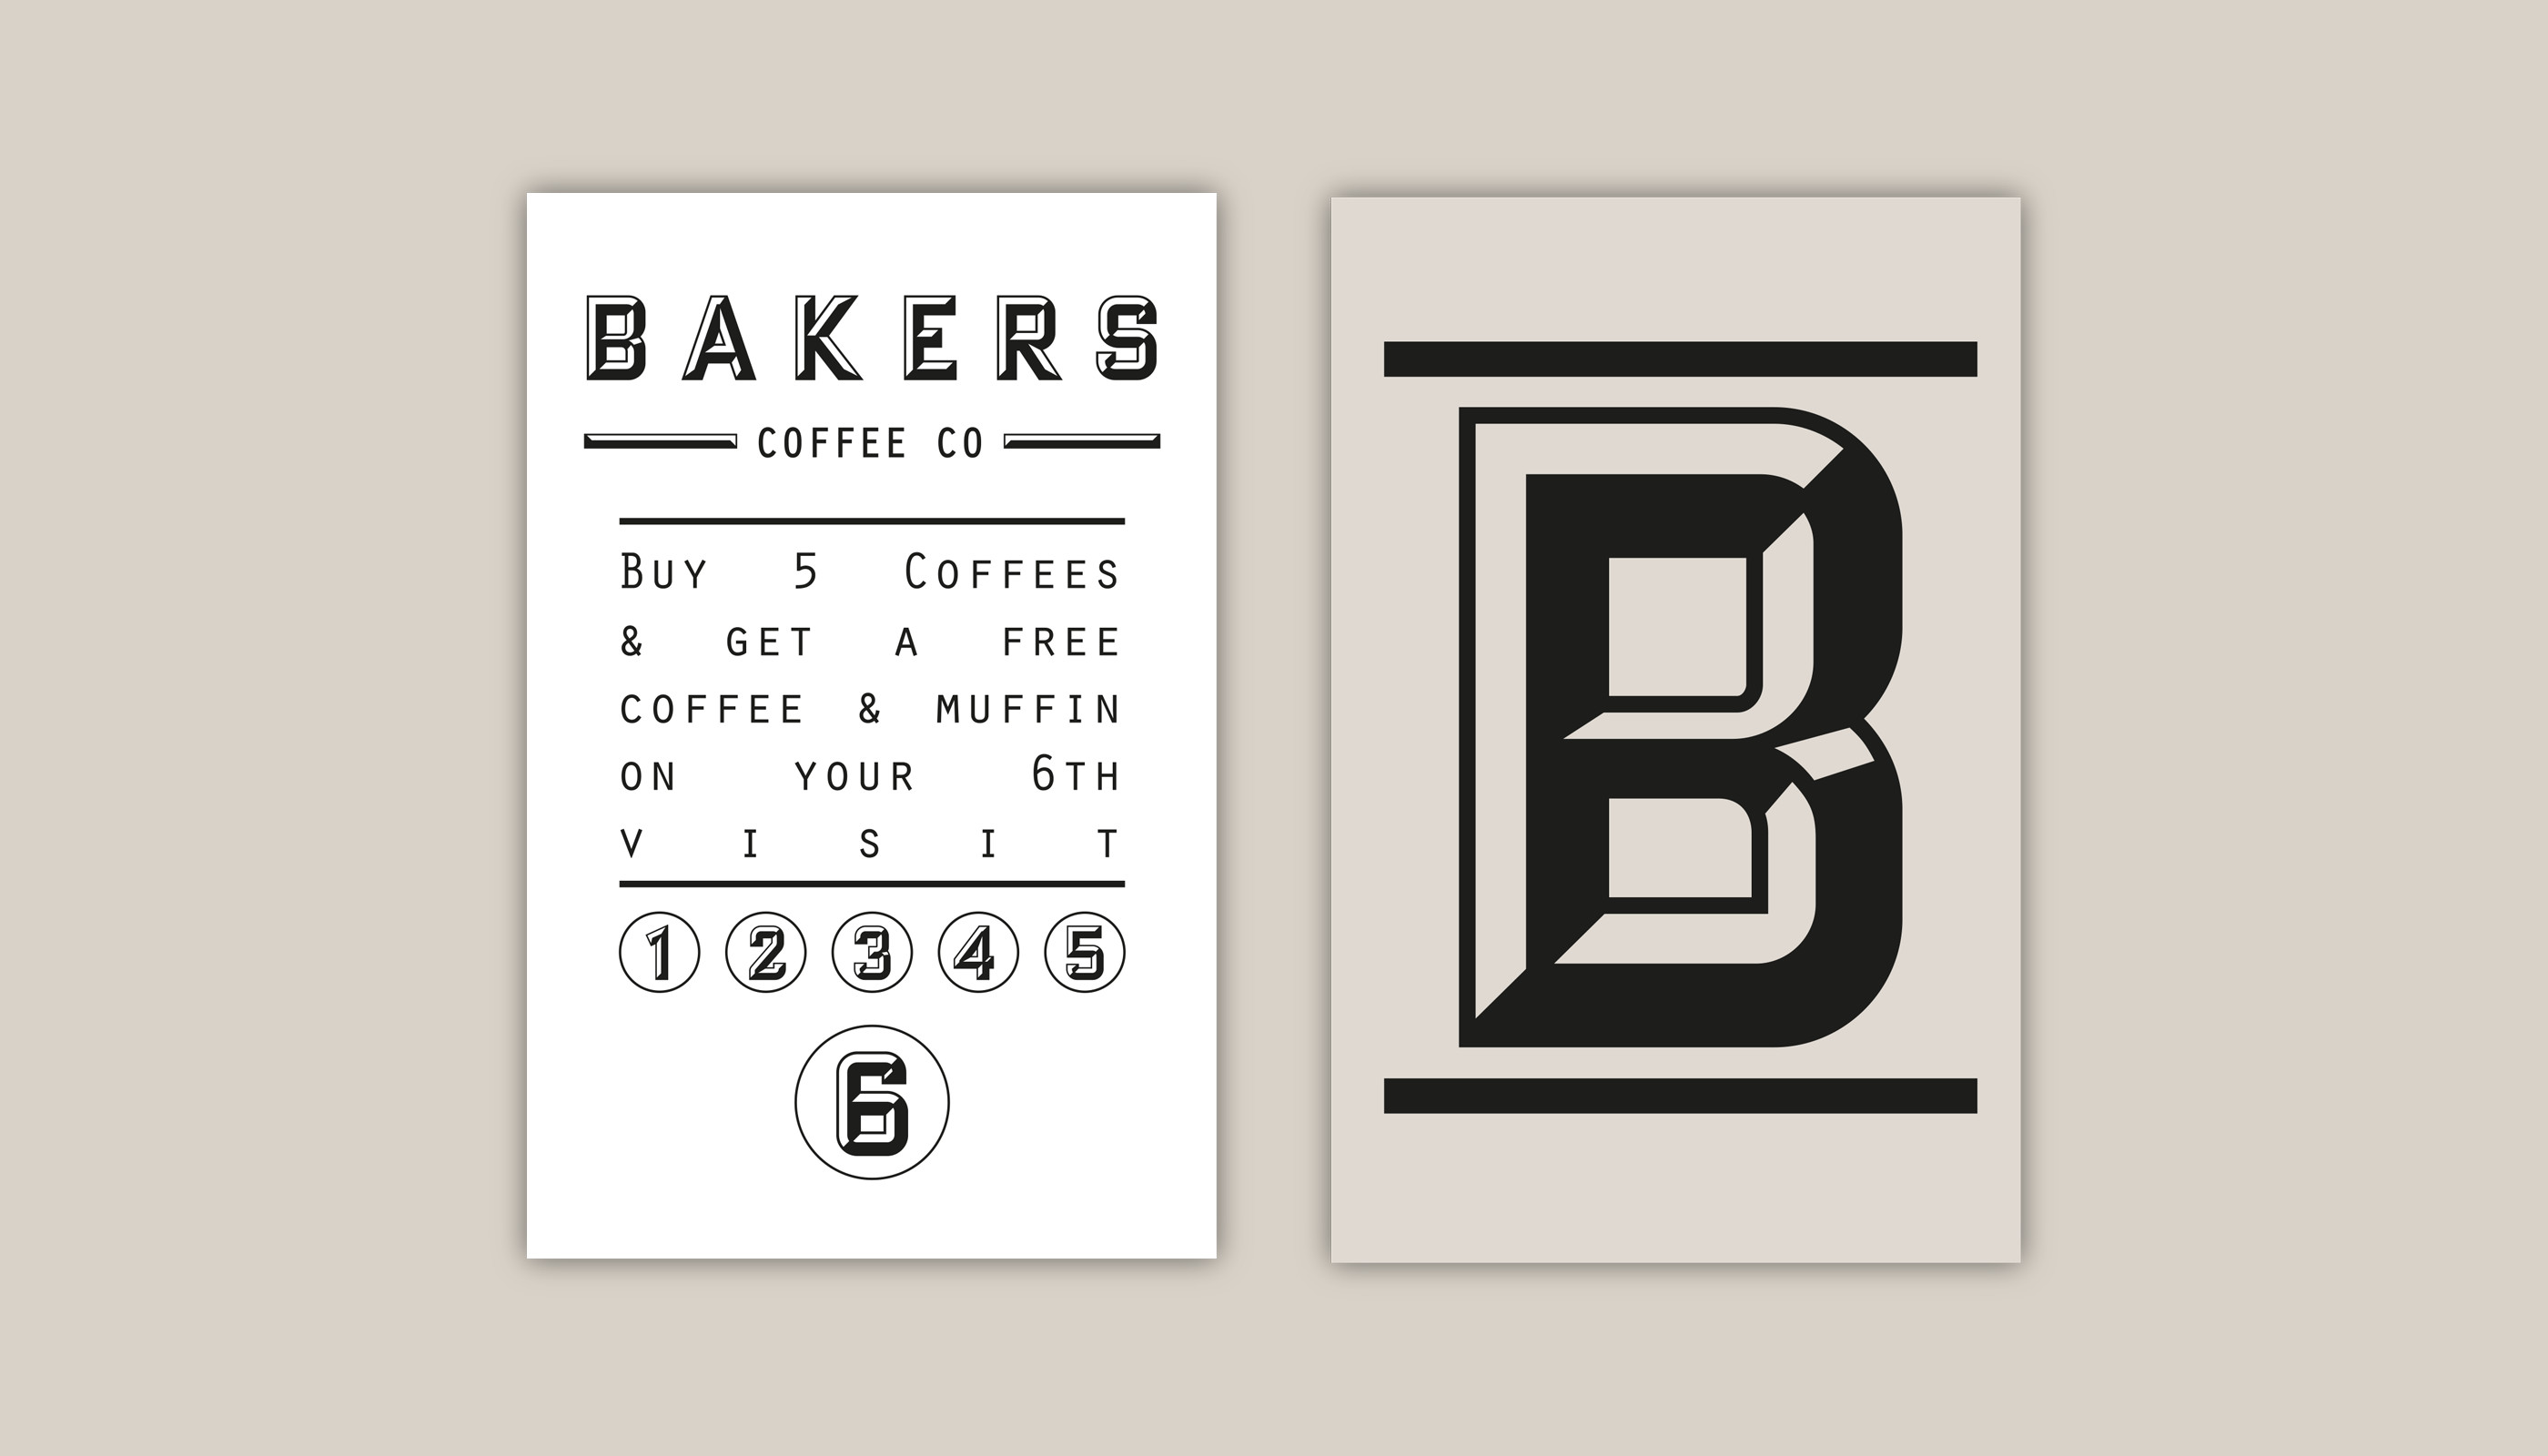 bakers_branding_02